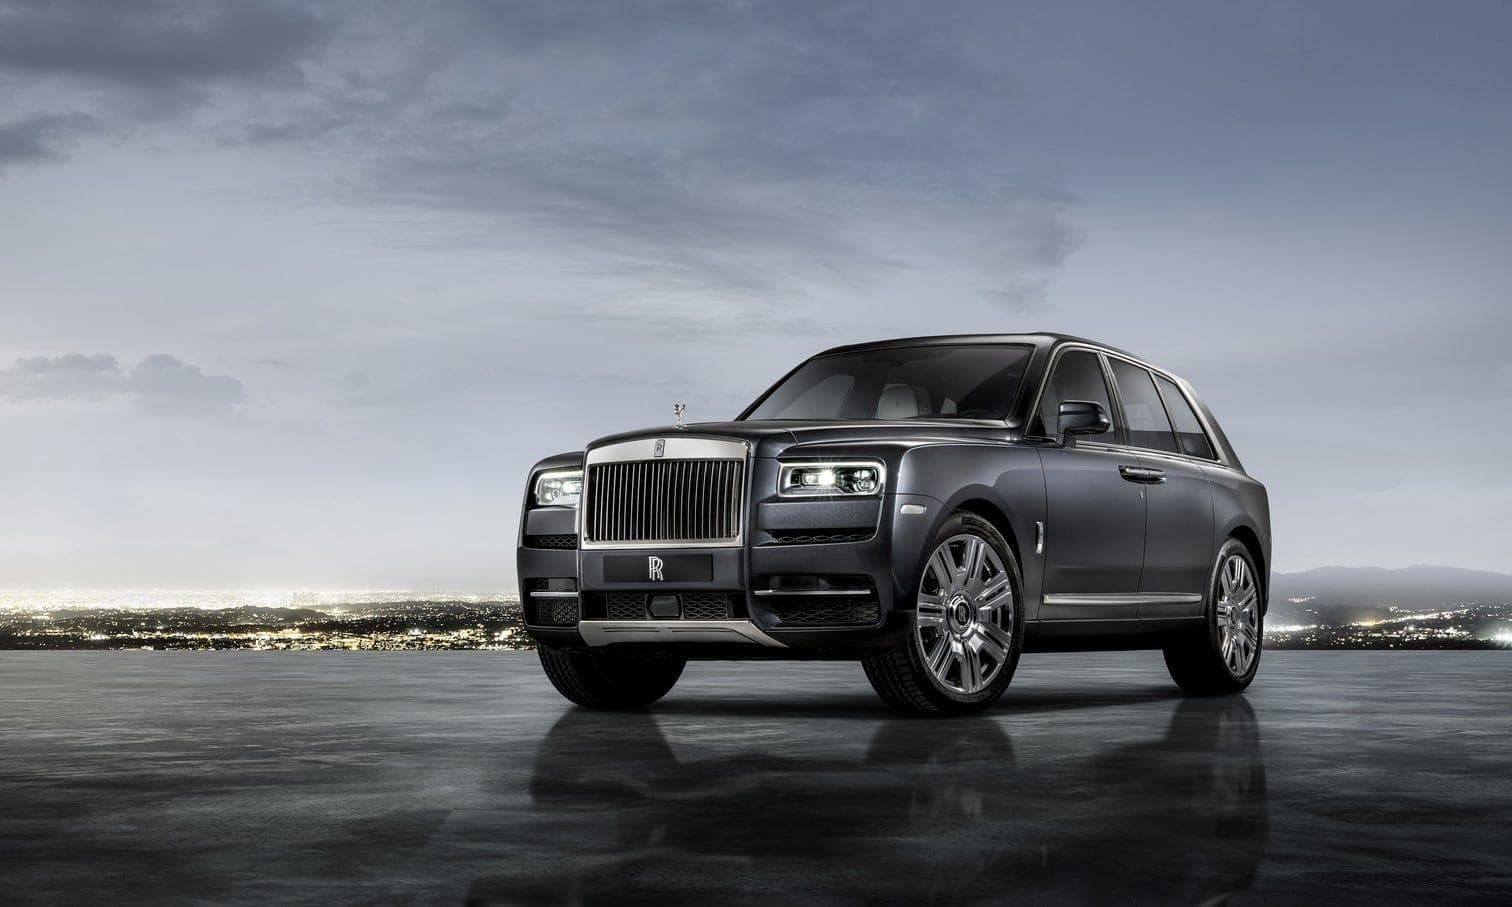 Foto: Rolls-Royce/dpa-tmn